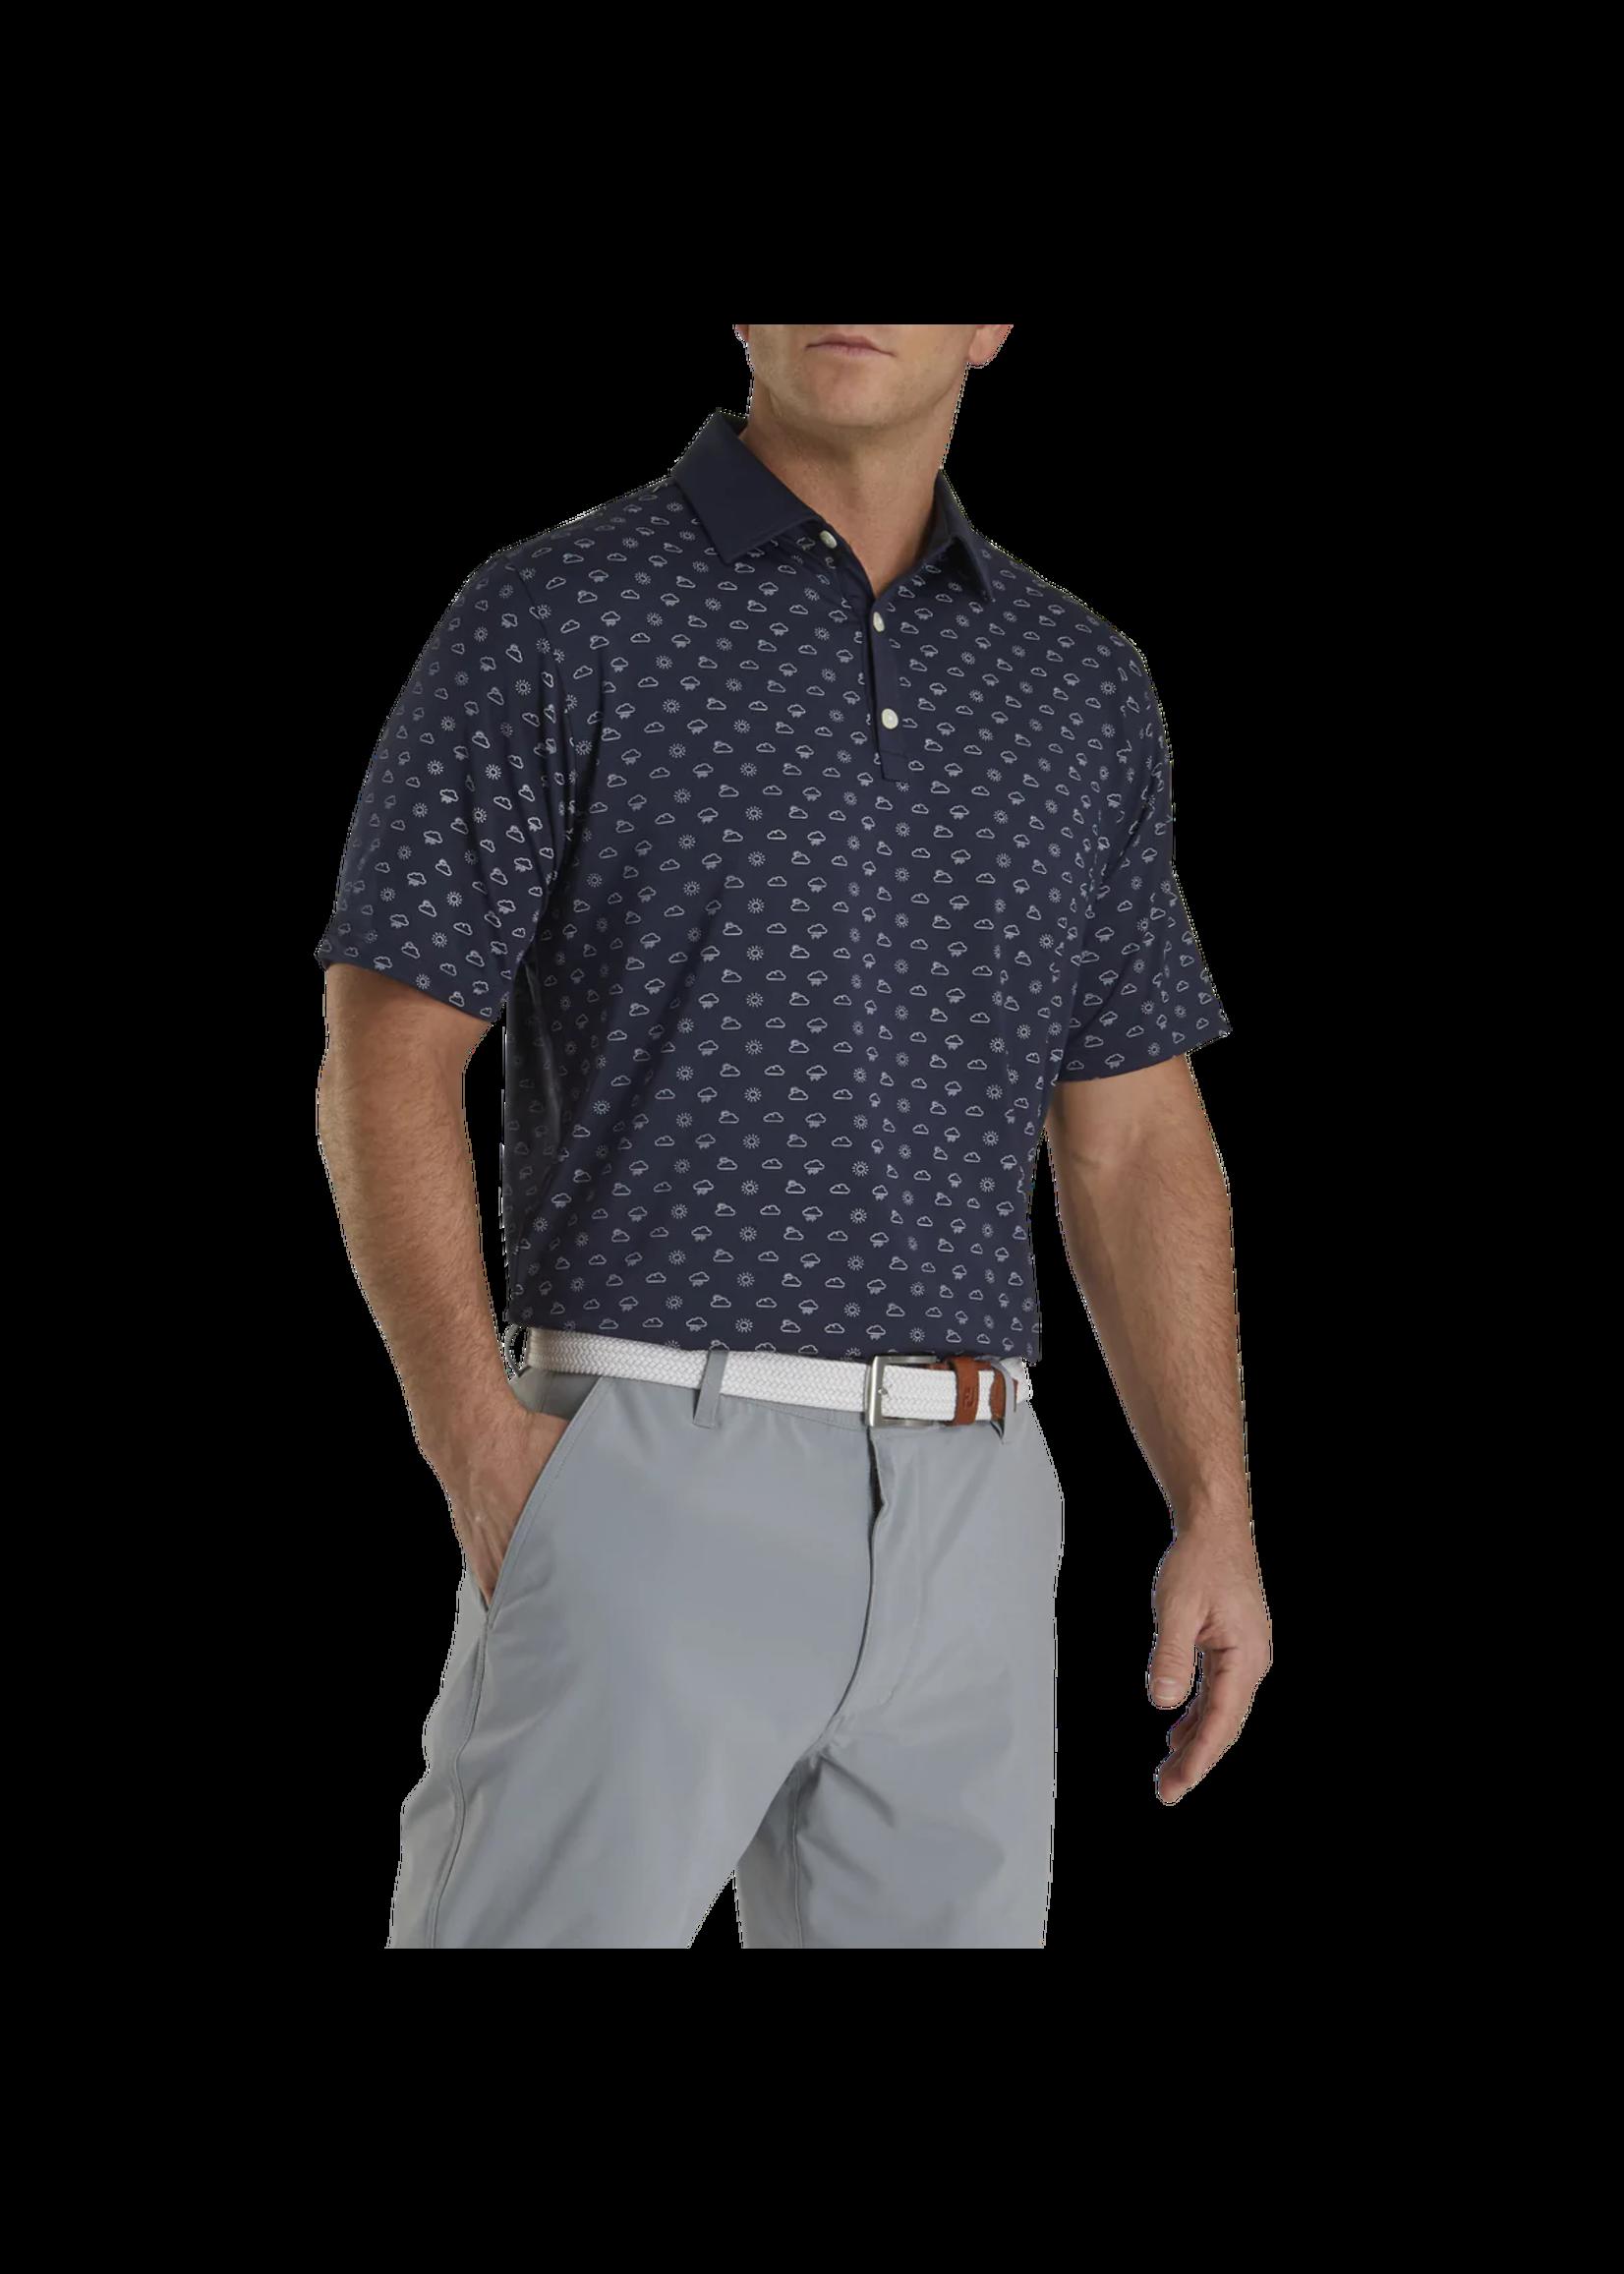 FJ Golf Shirt Weather